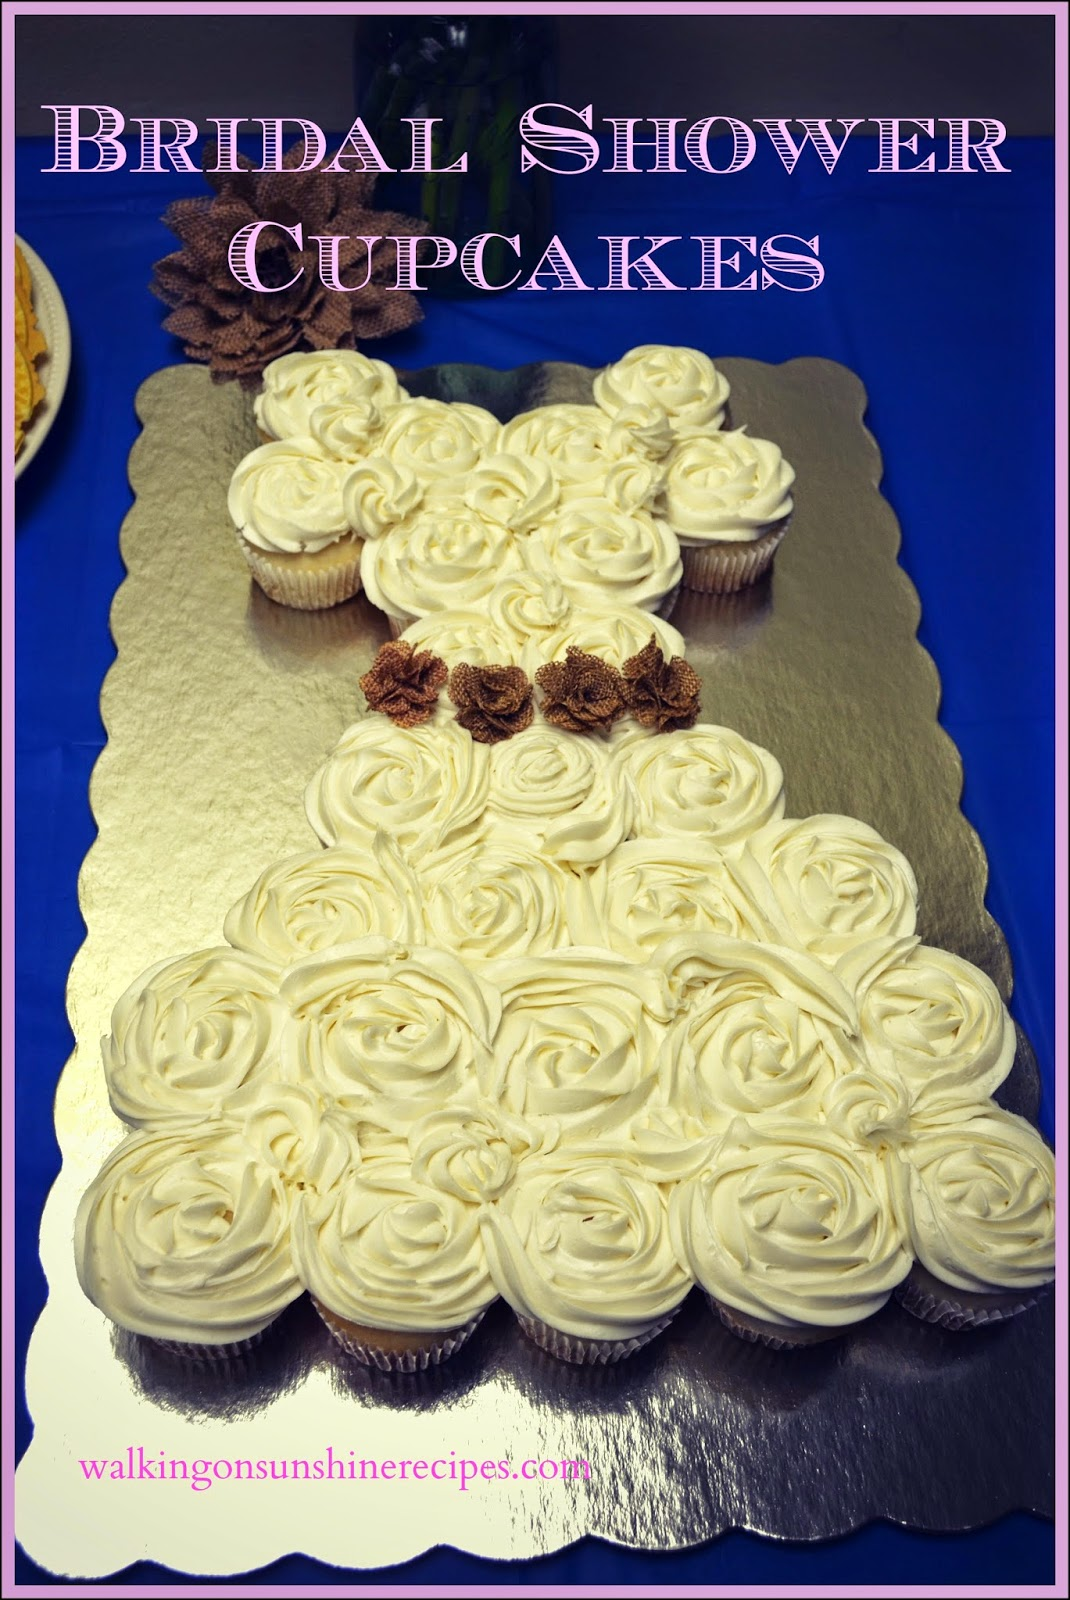 Bridal Shower Cupcakes - Walking On Sunshine - HMLP 82 - Feature